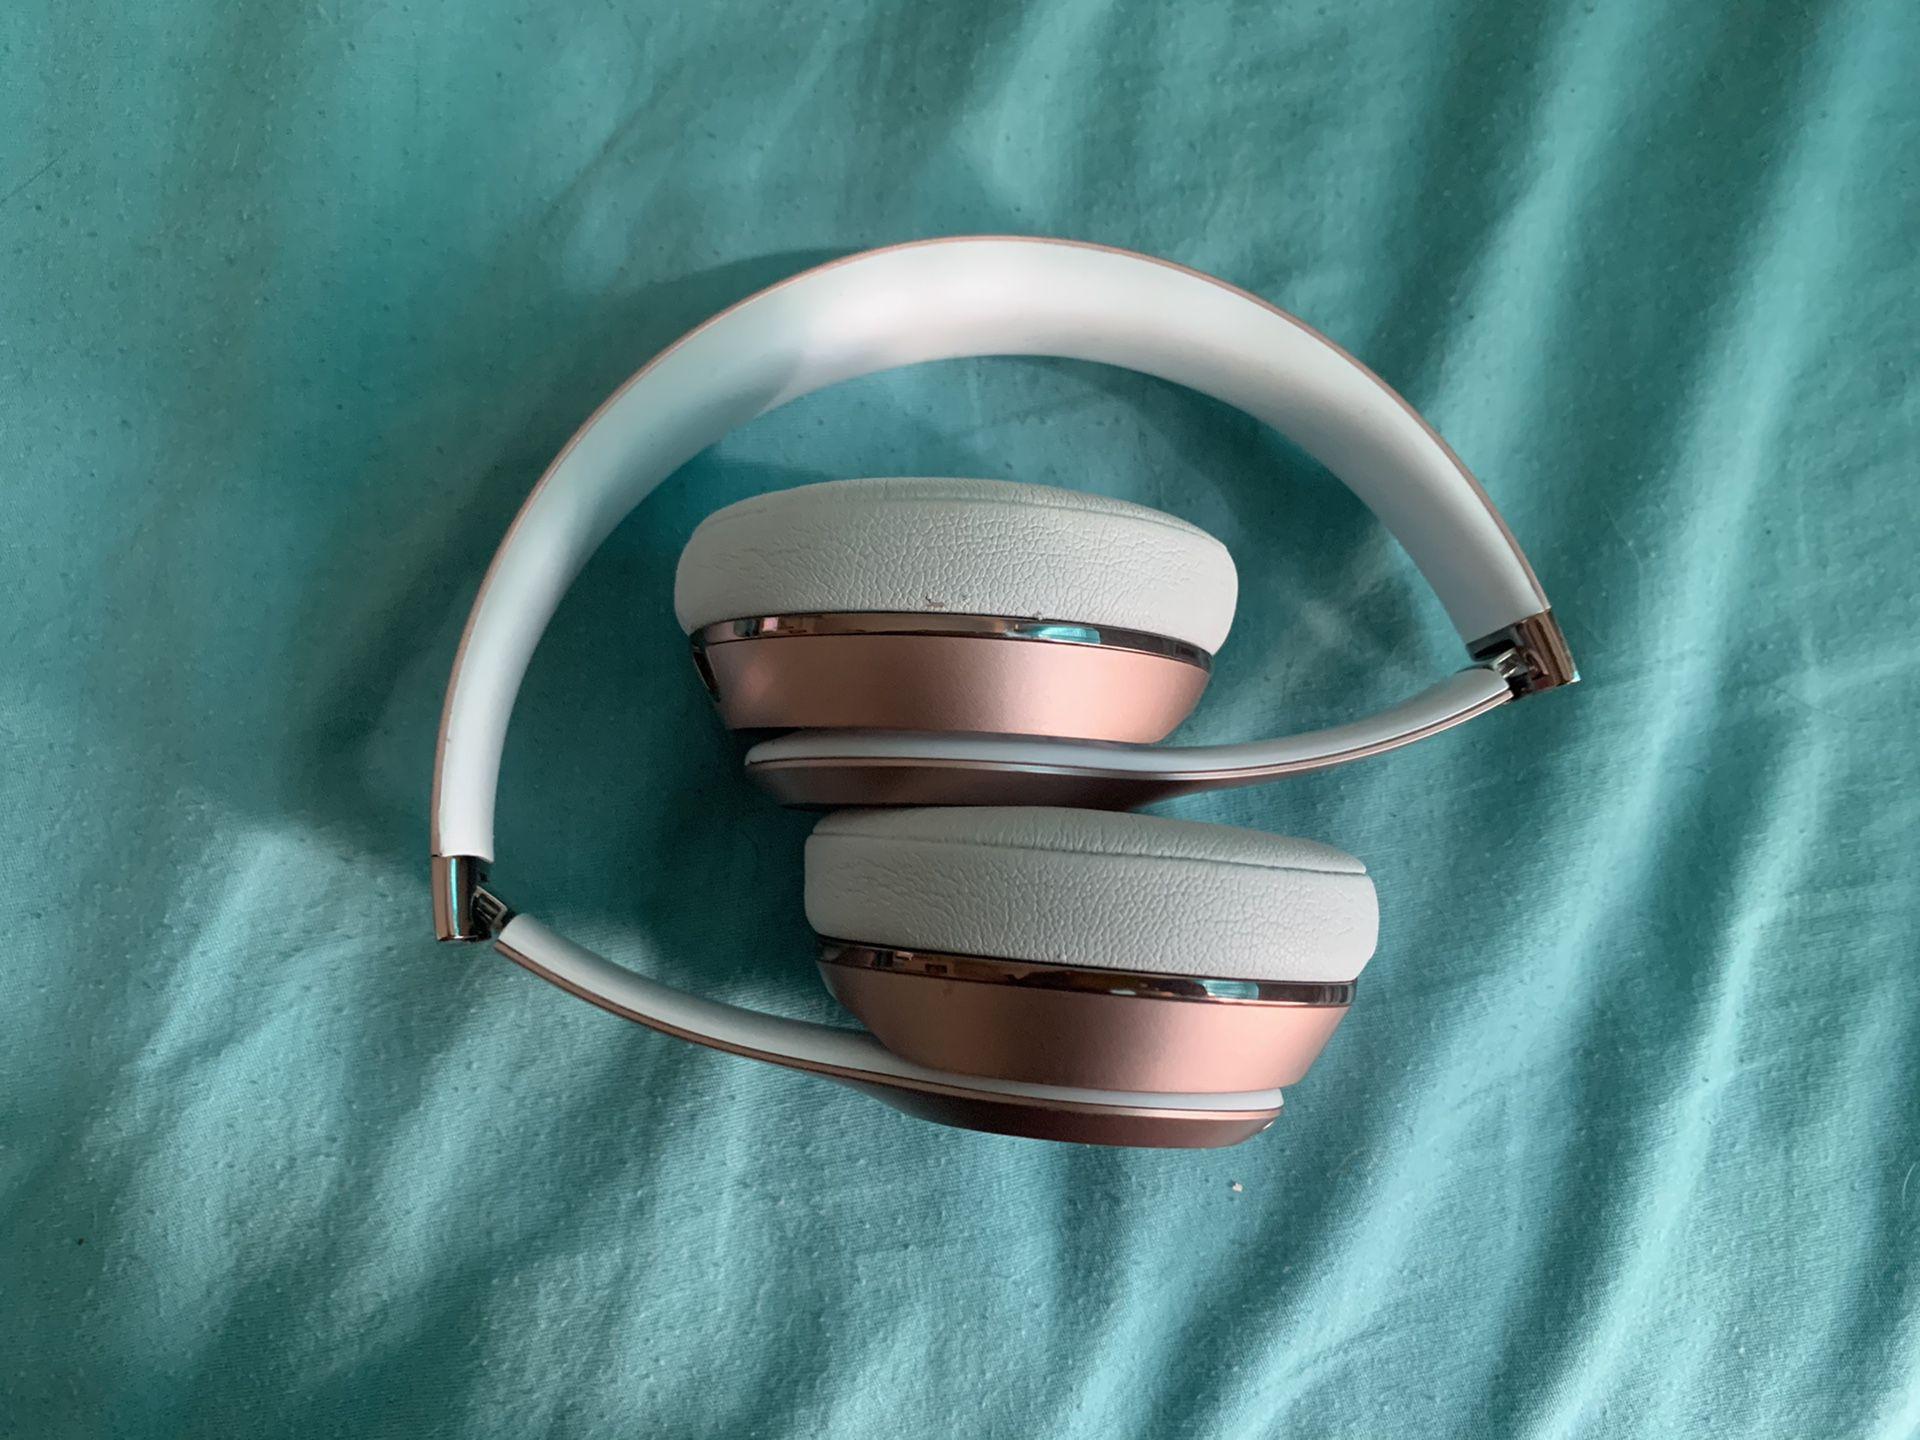 Rose gold beats wireless